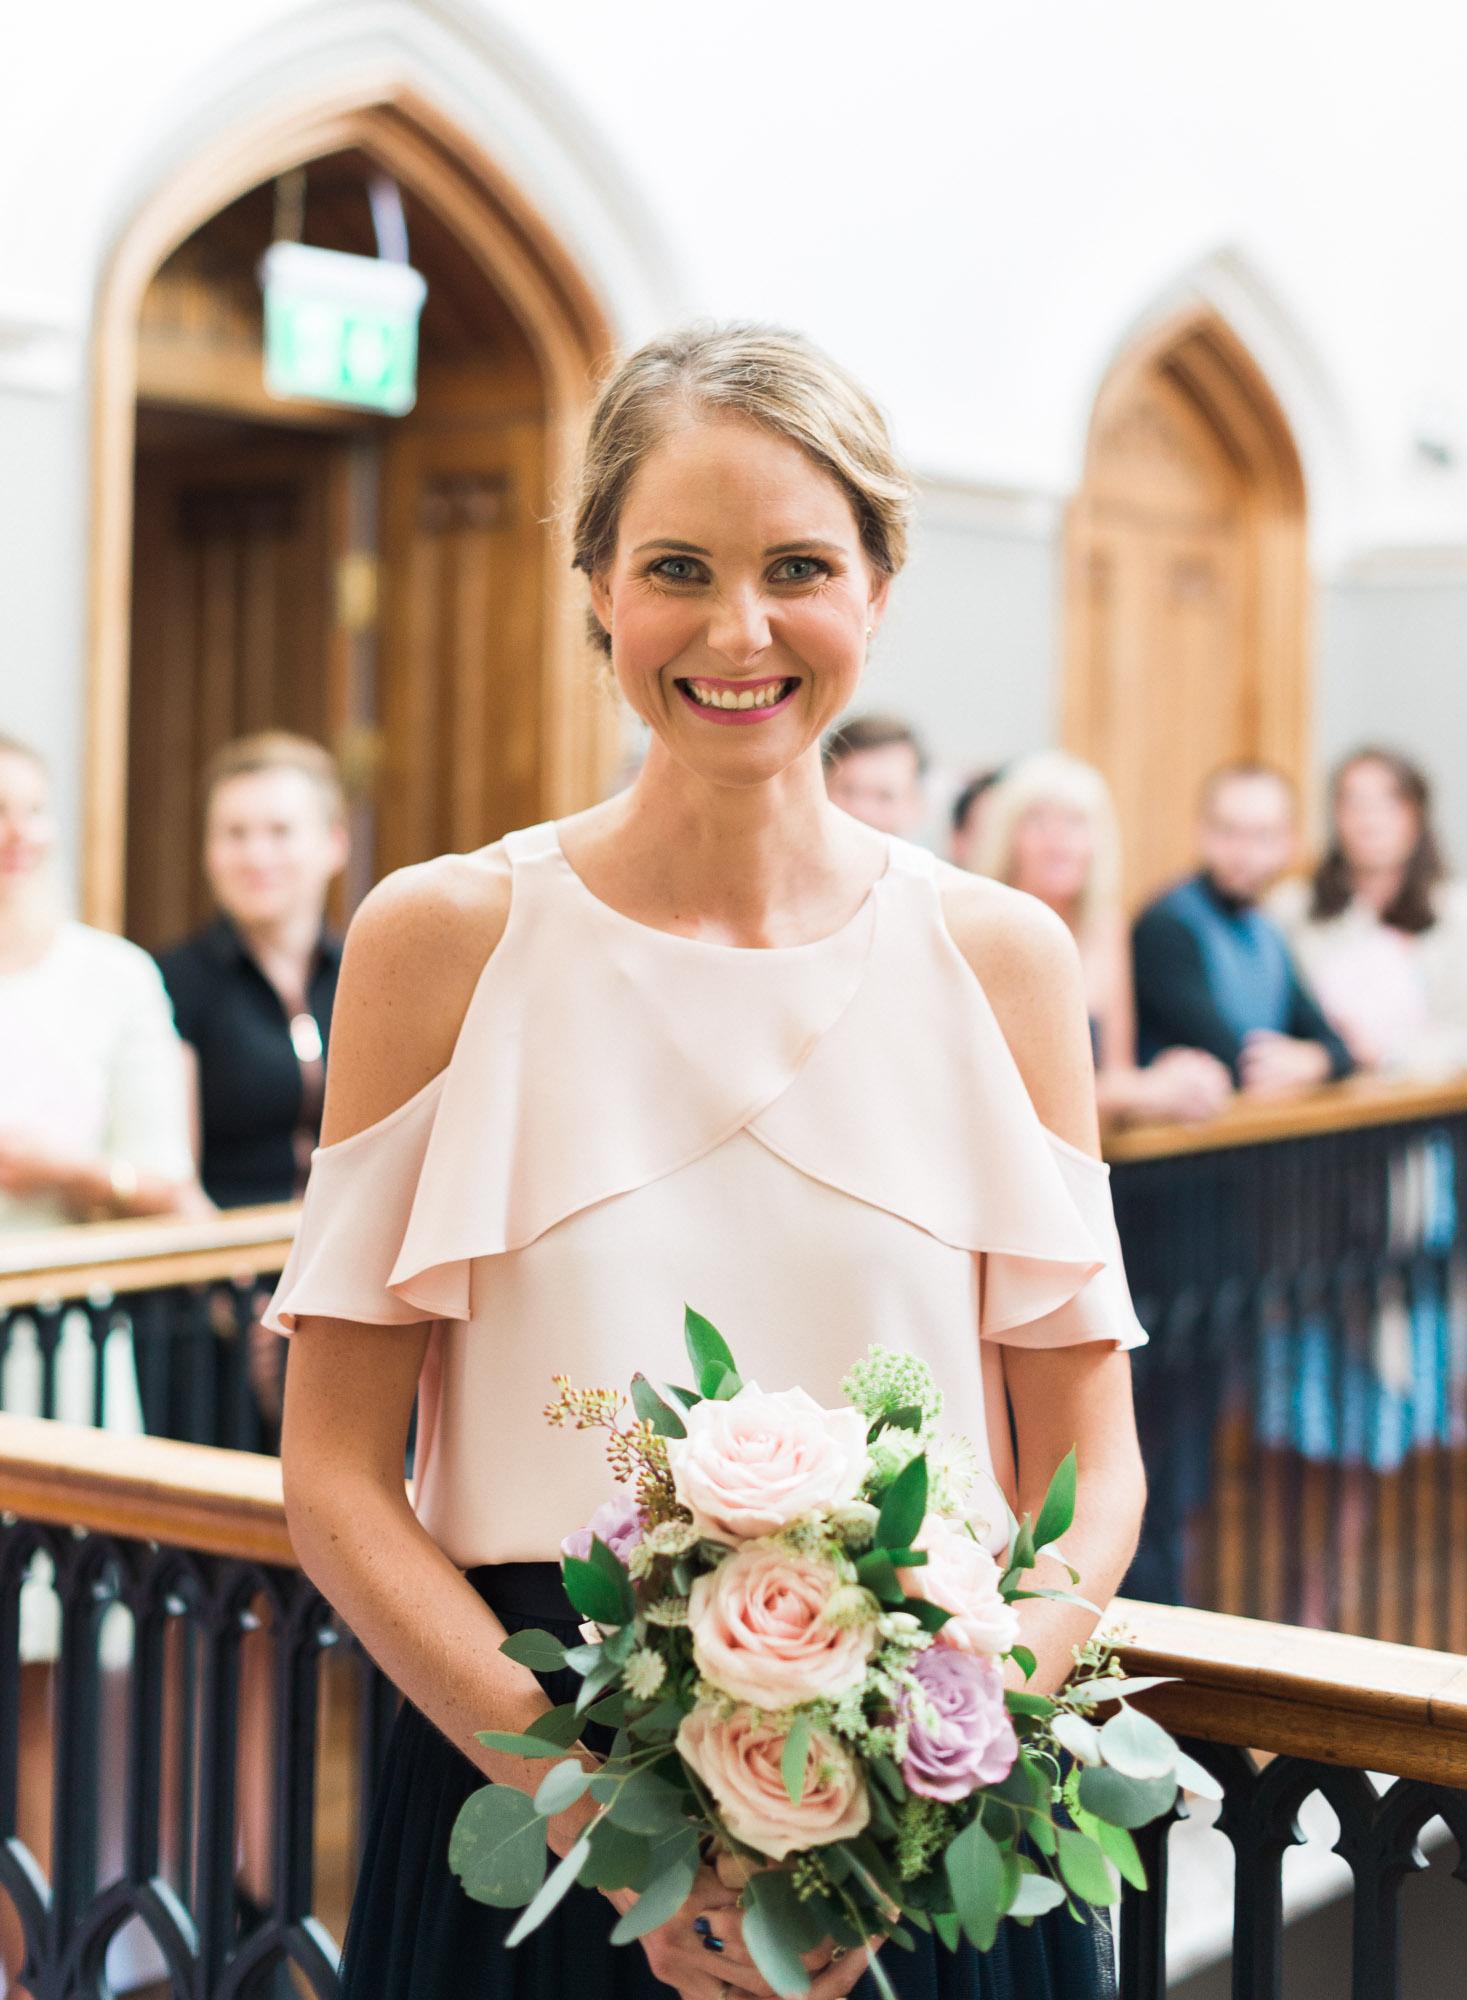 scottish_wedding_blairquhan_castle-63.jpg